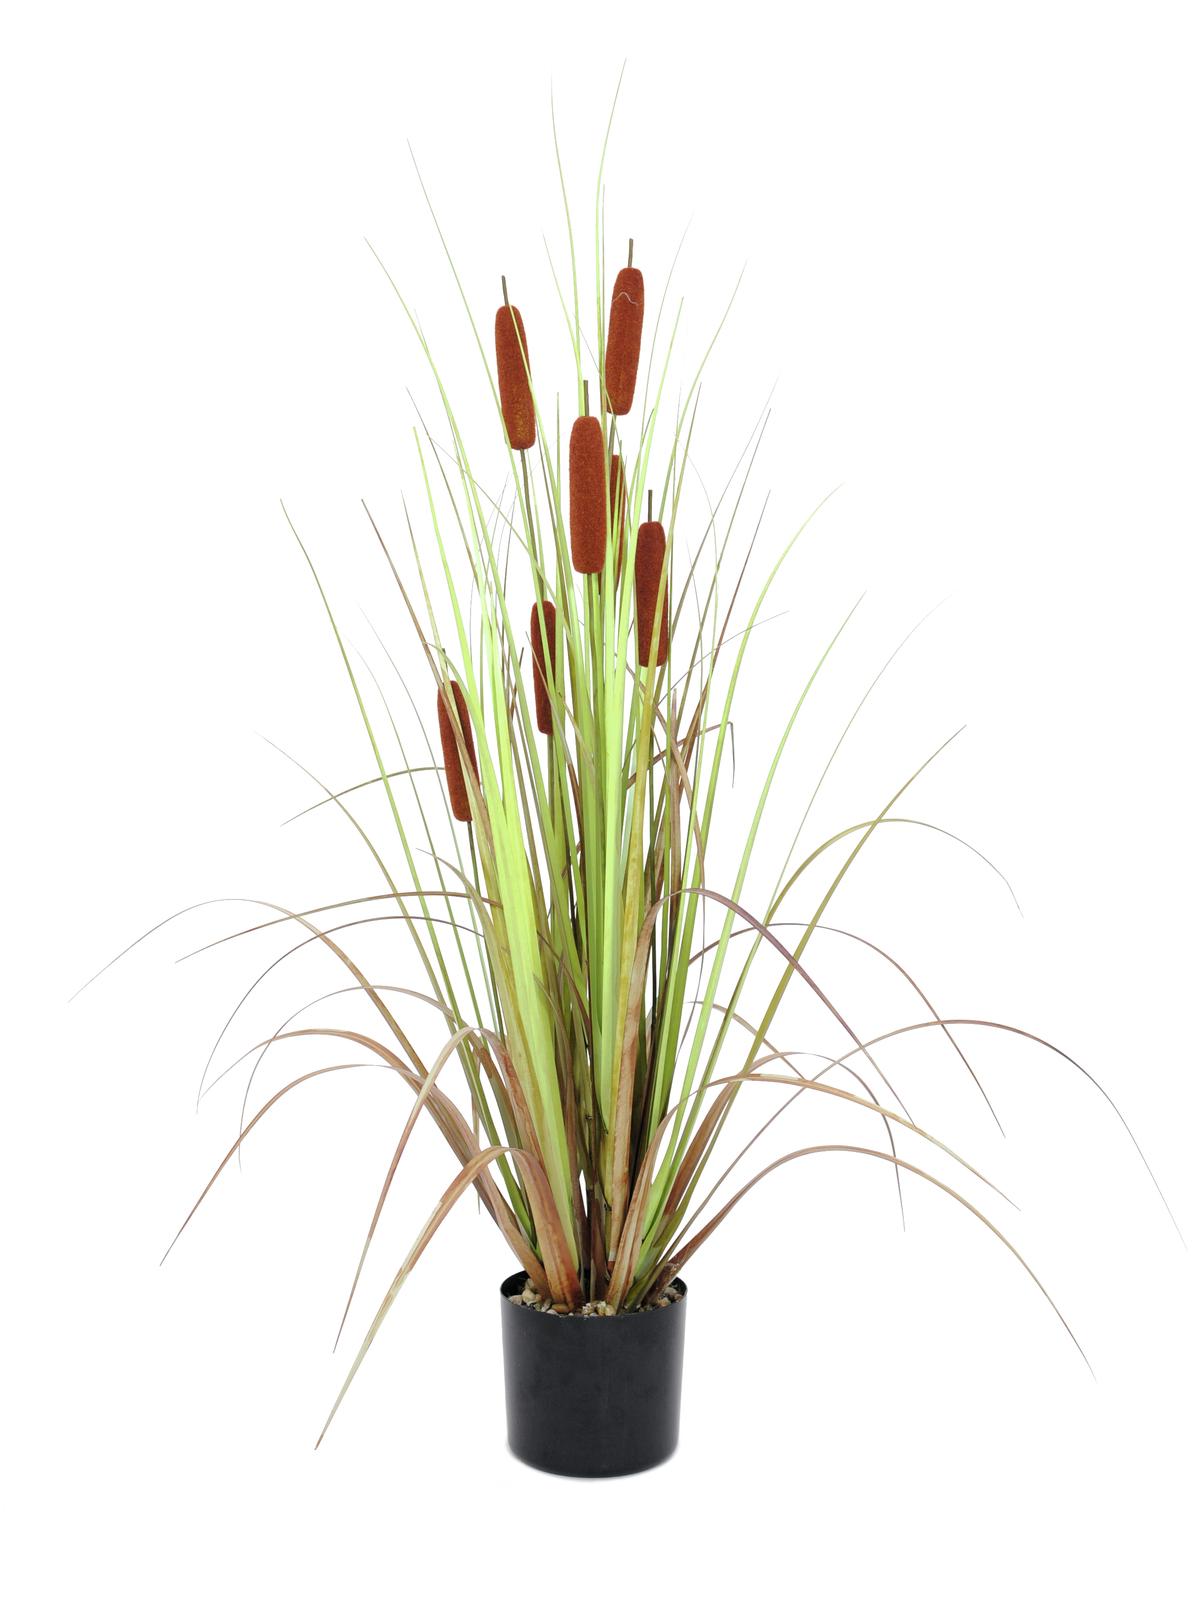 EUROPALMS Rohrkolben, Kunstpflanze, 120cm